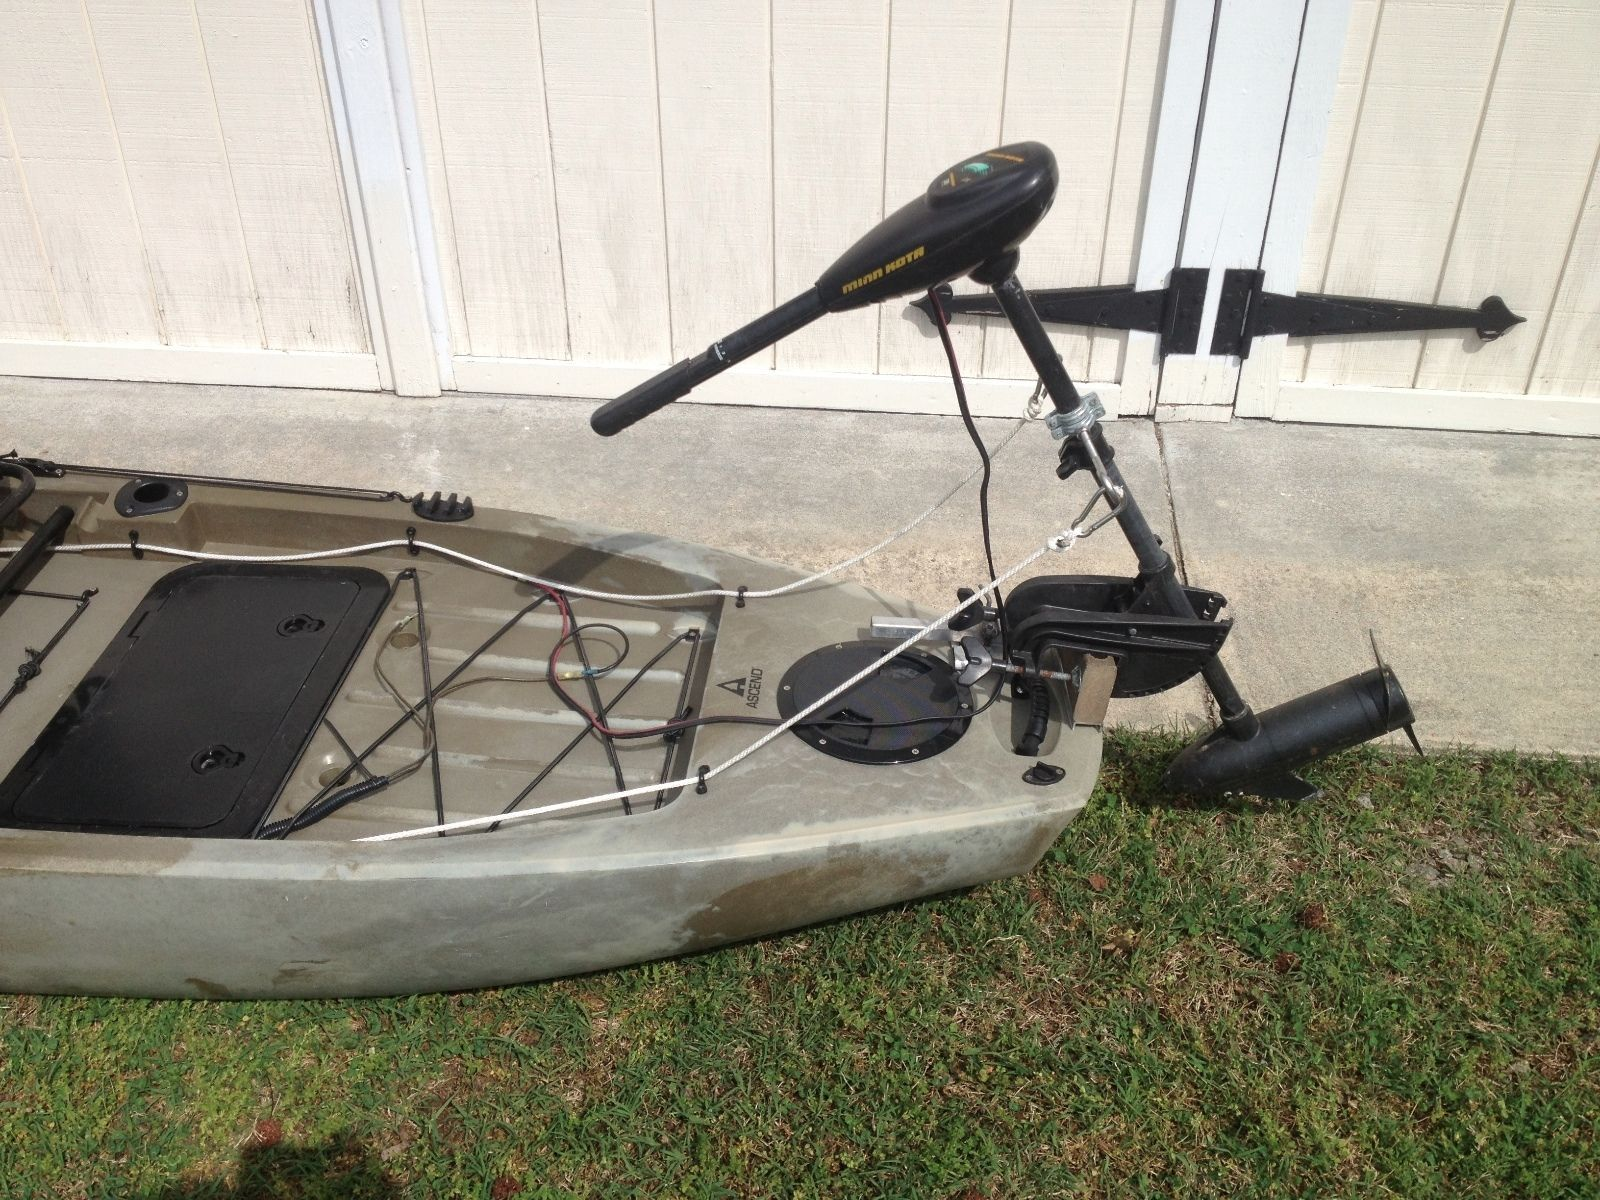 Details about 2019 Hobie Mirage Pro Angler 12 Fishing Kayak